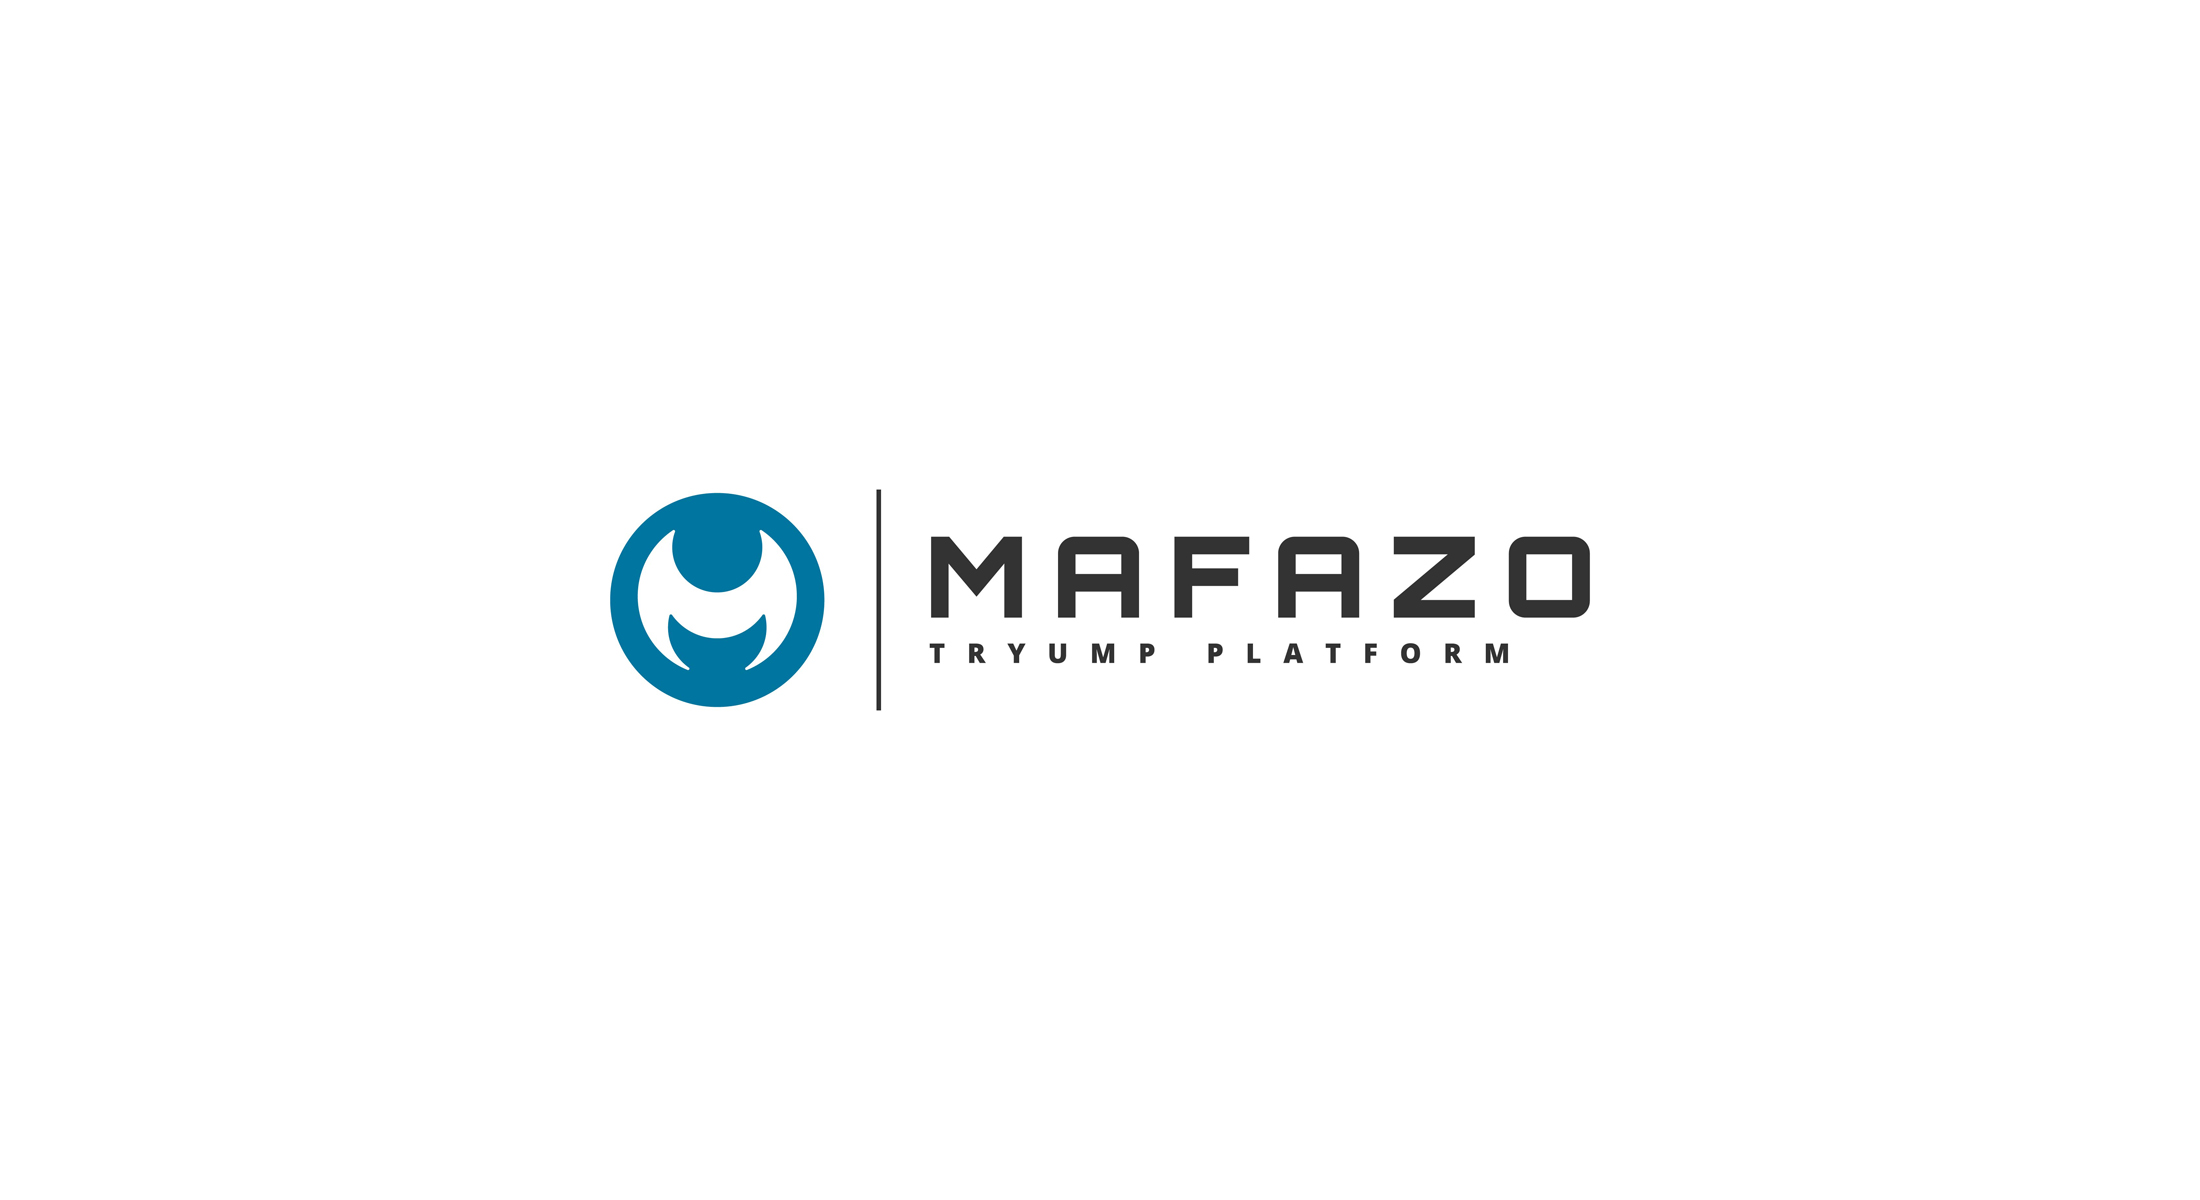 Mafazo.jpg